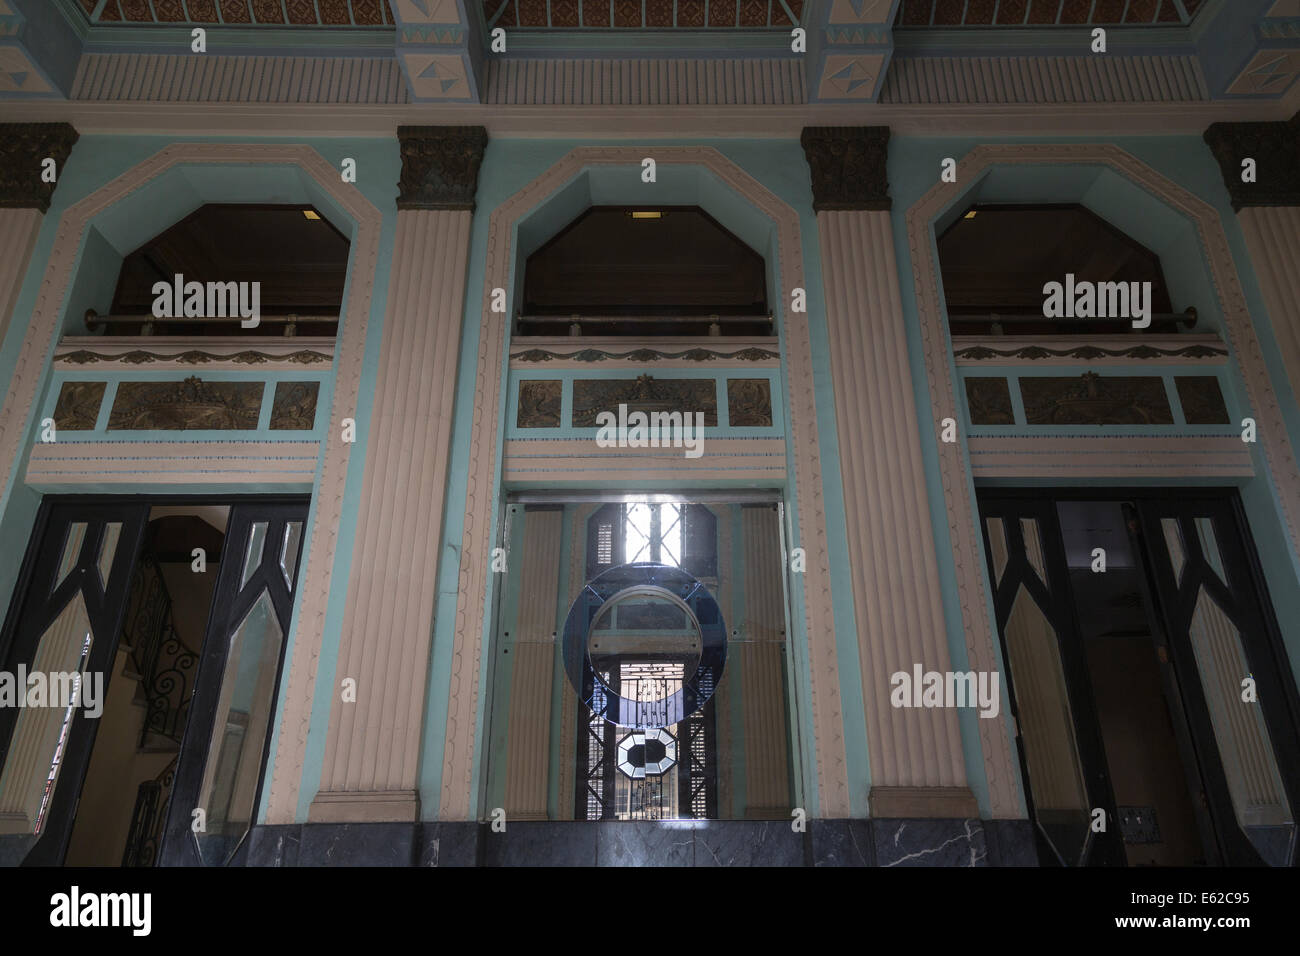 lobby, Bacardi building, art deco masterpiece, Havana, Cuba - Stock Image